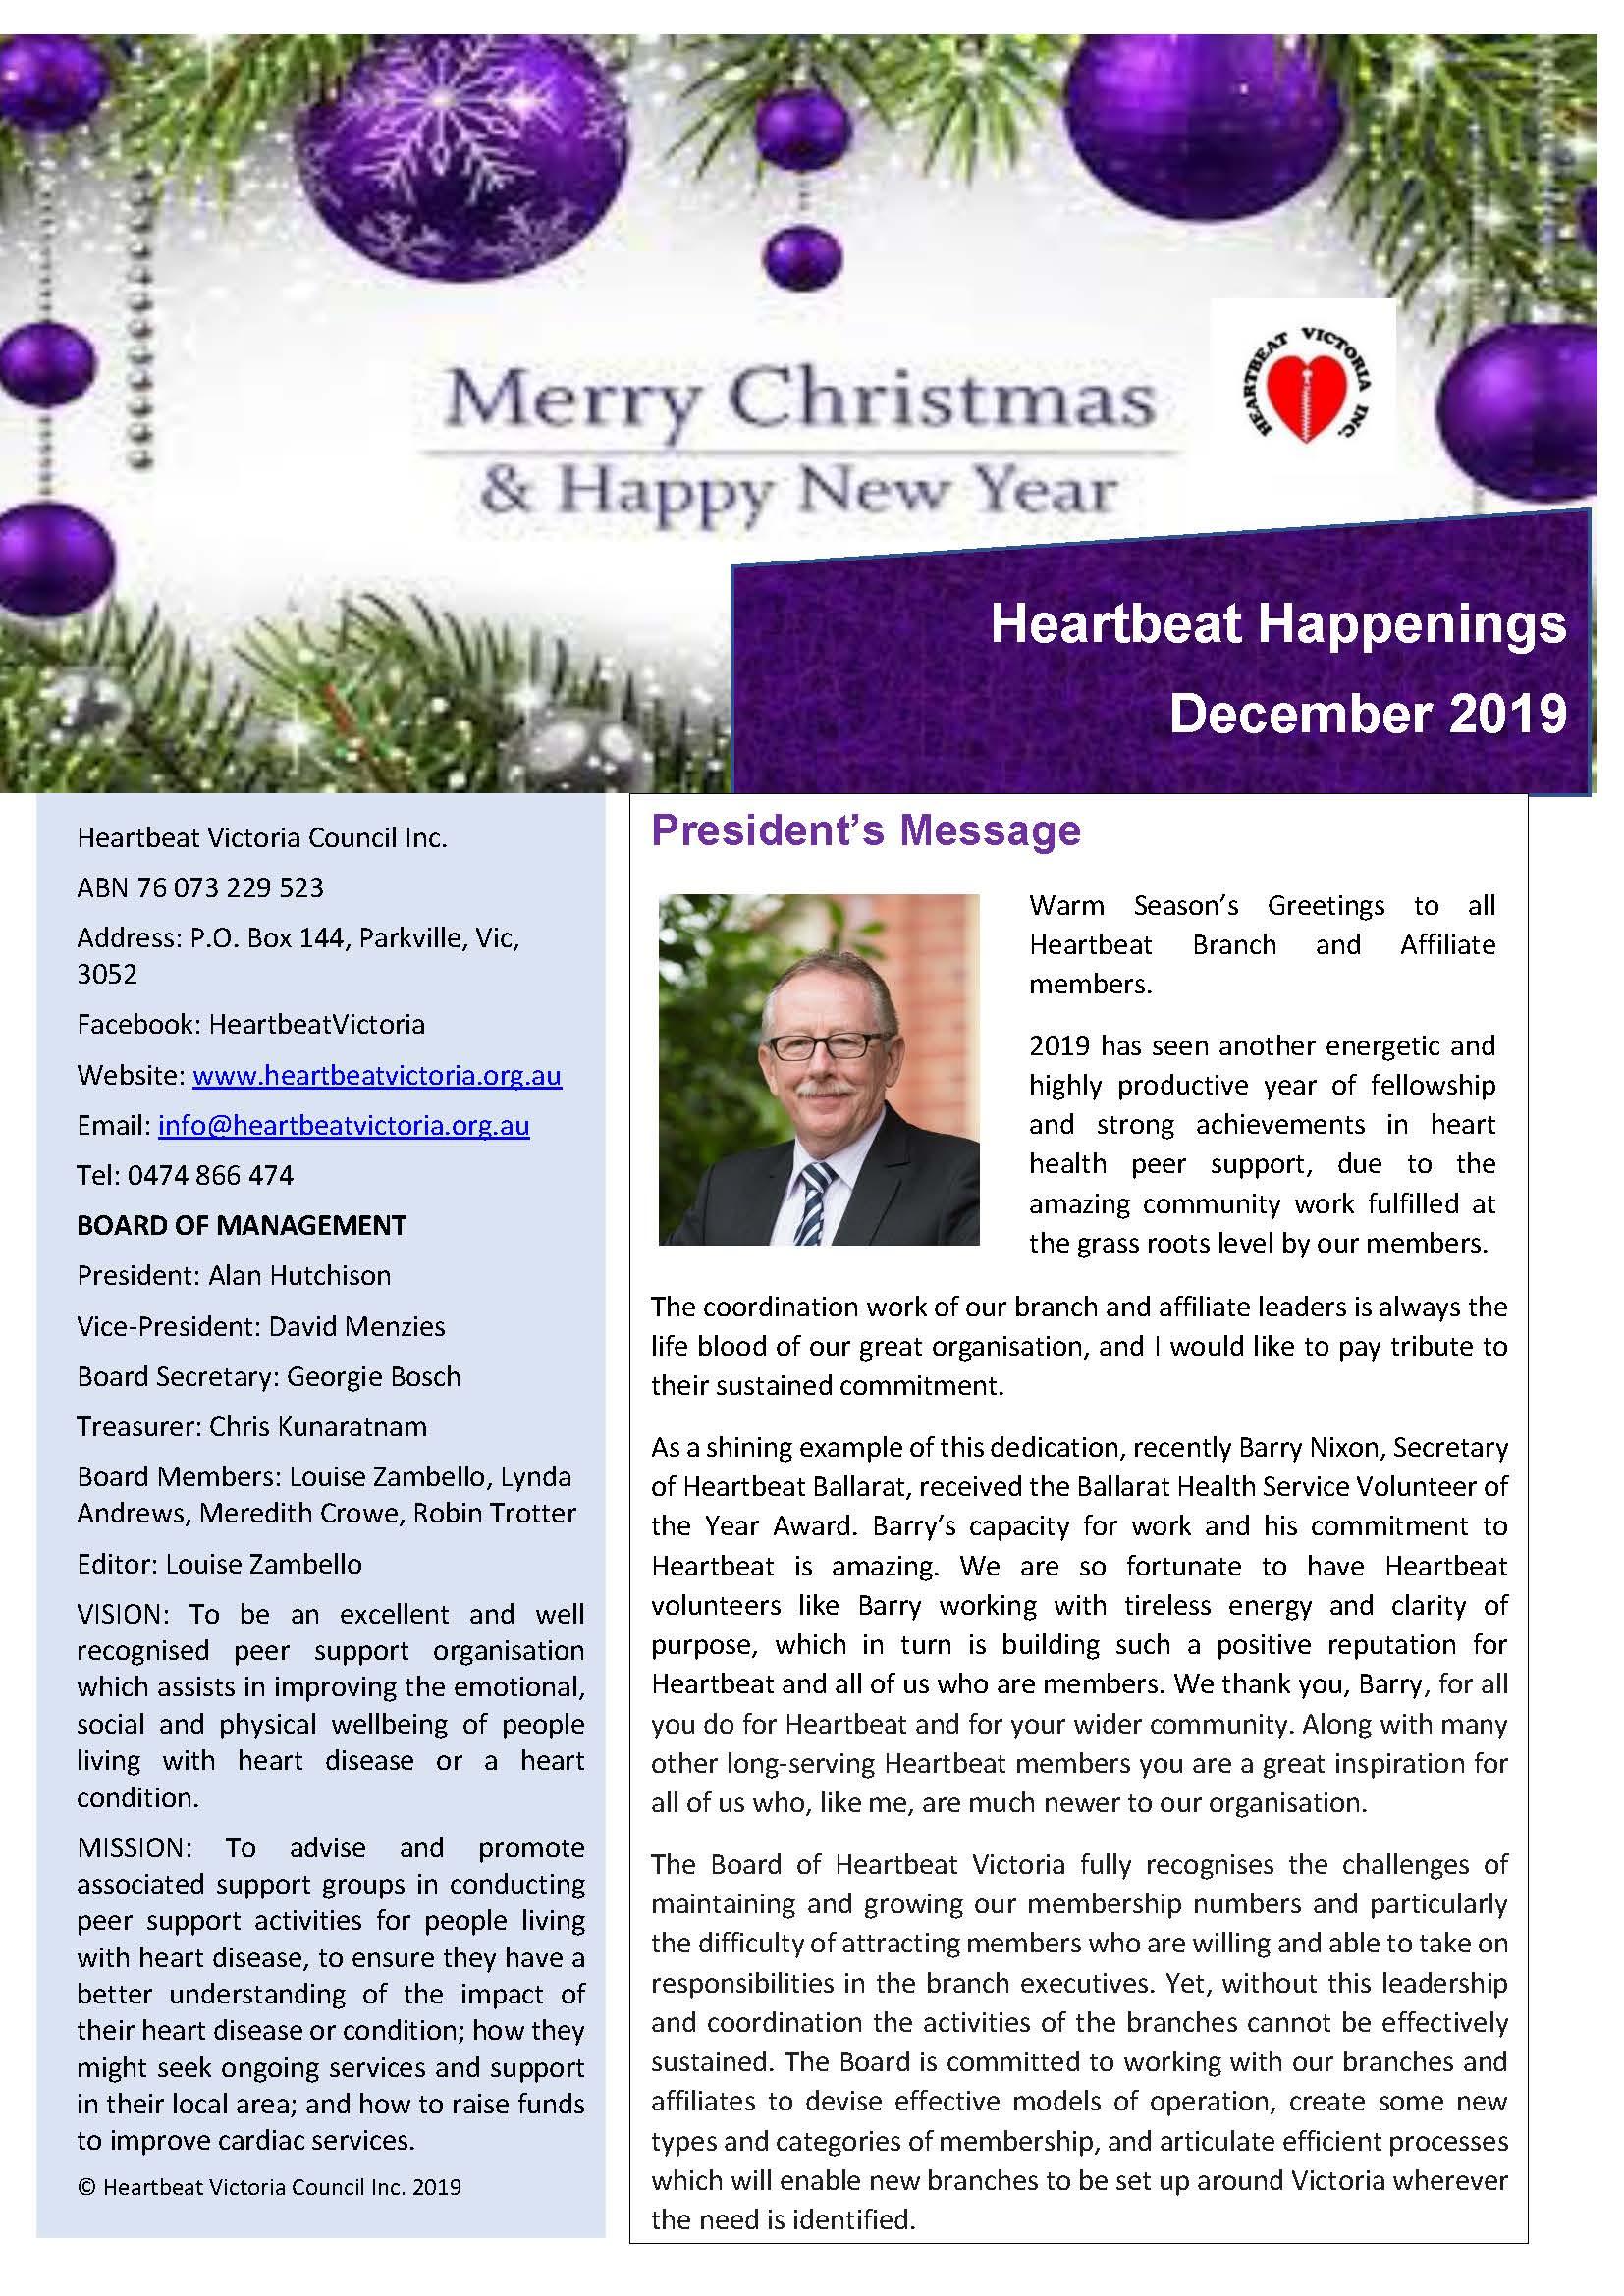 Heartbeat Happenings December 2019